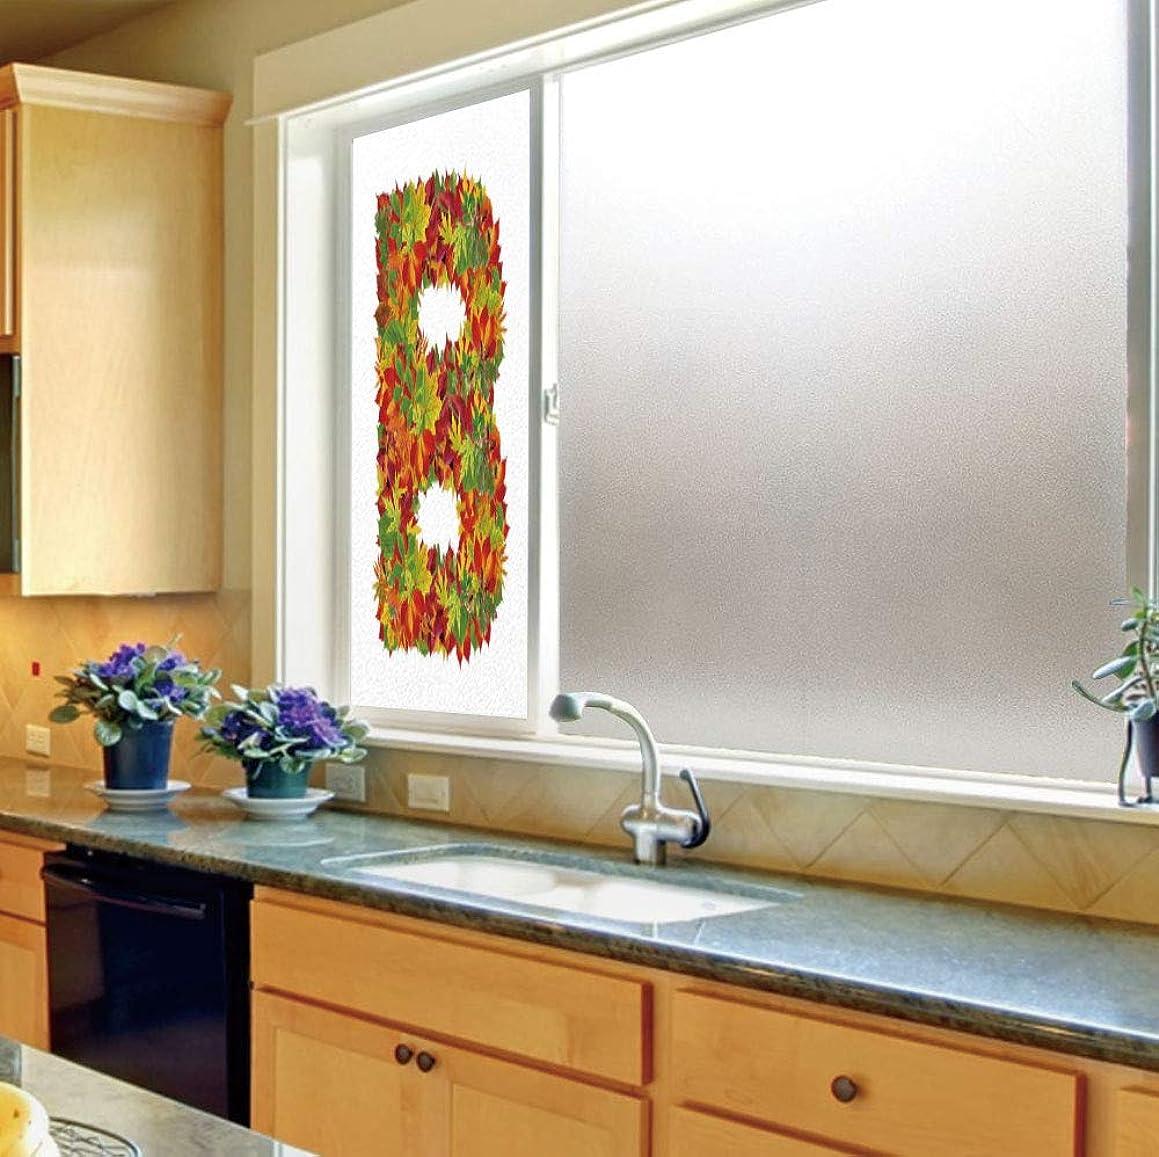 YOLIYANA Control Heat and Anti UV Window Cling,Letter B,Reduce Heat, Glare and Block Out Harmful UV Rays,Seasonal Leaves Fall Color Alphabet Capitalized B Symbol,24''x70''